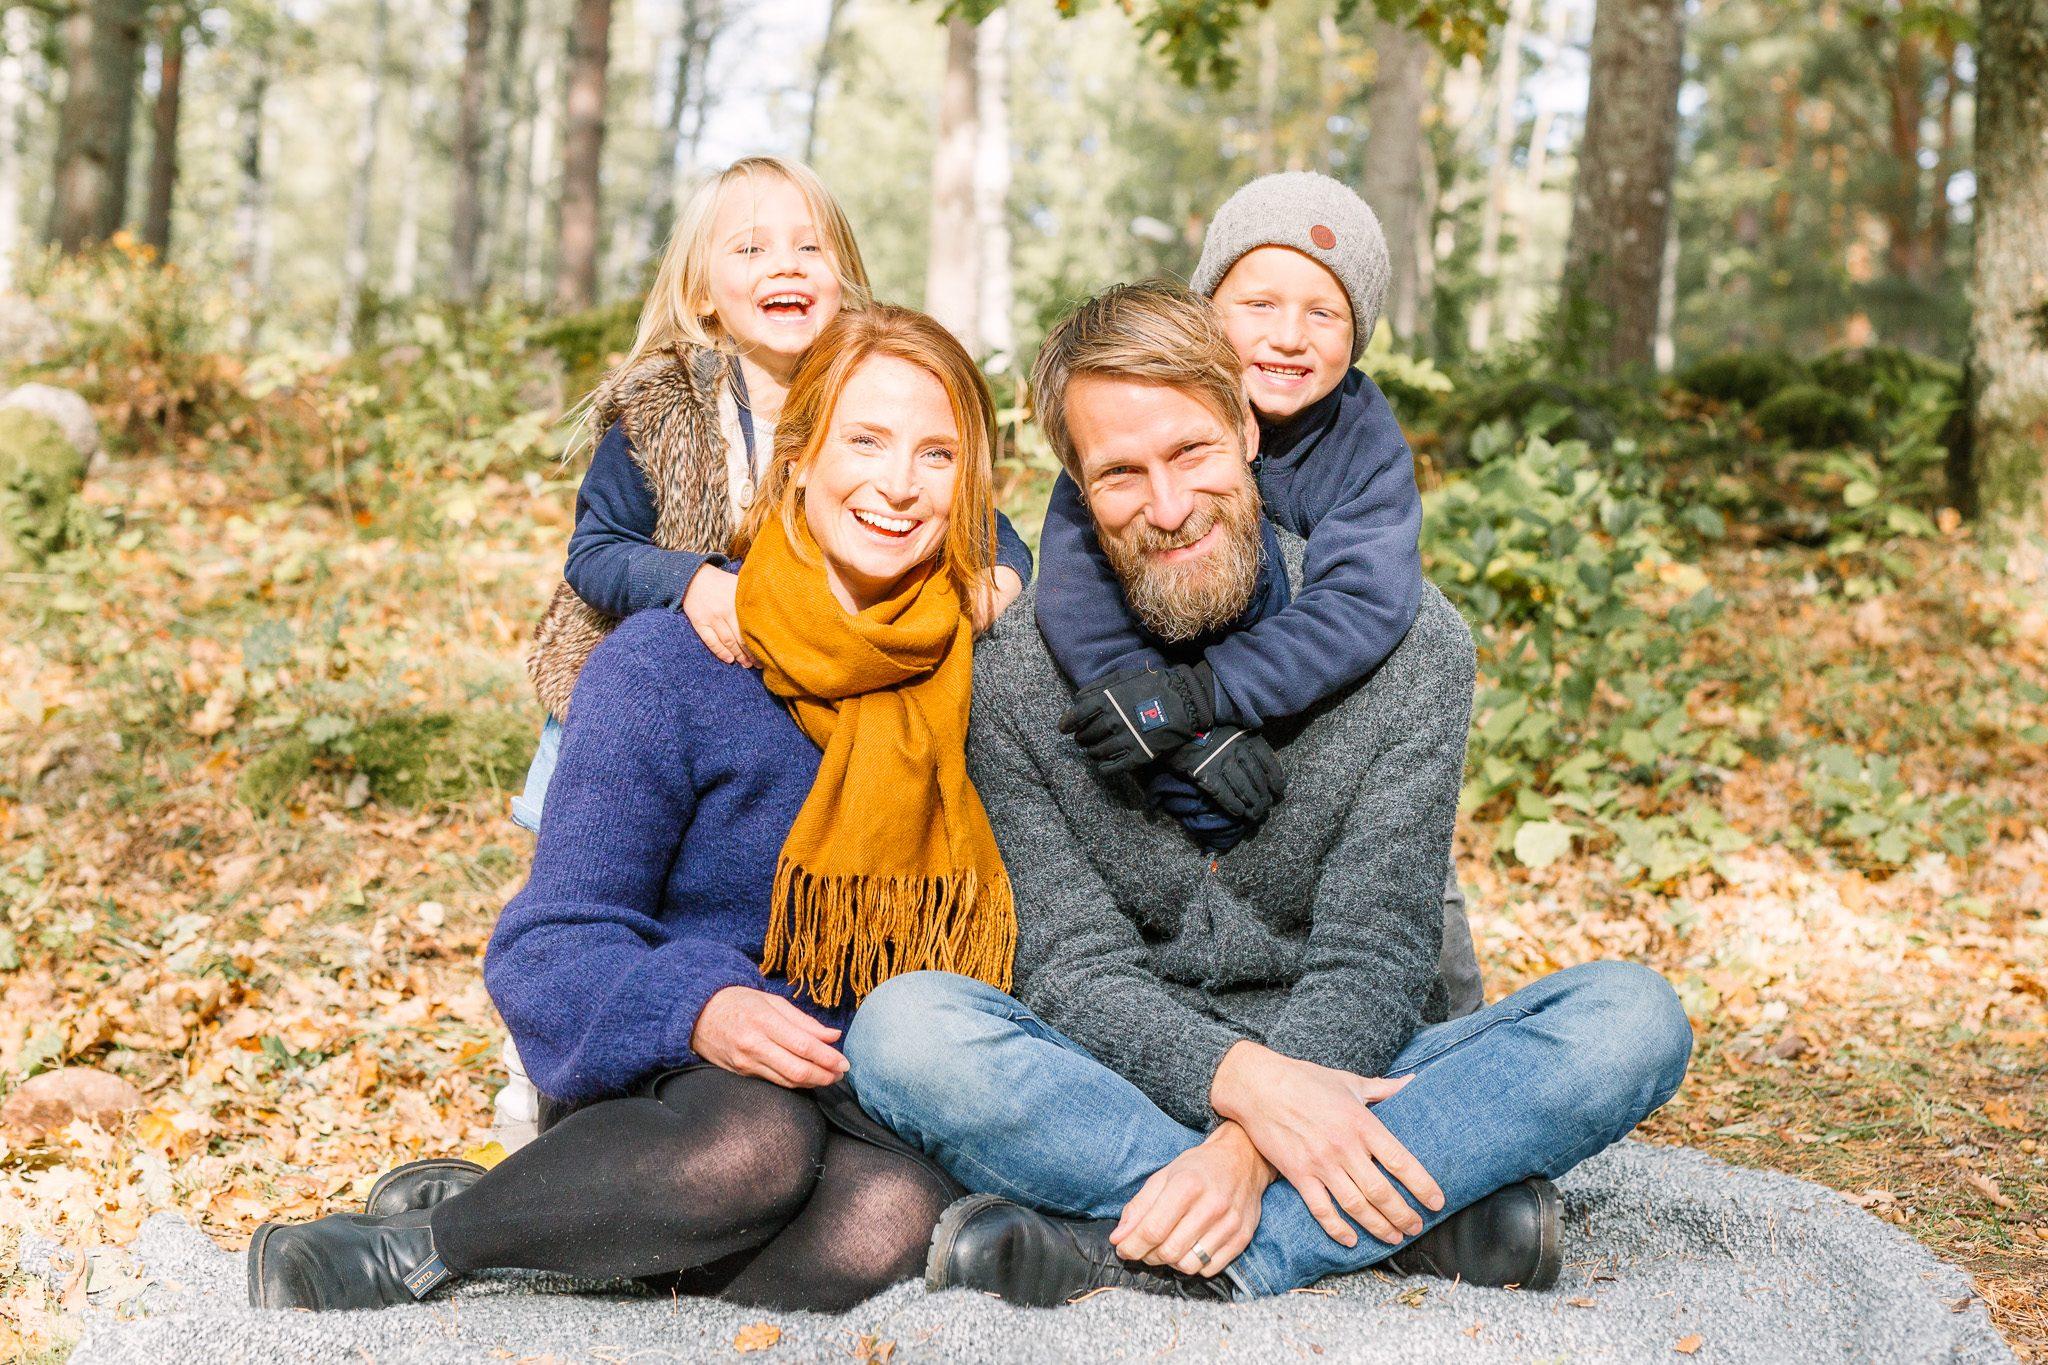 karinkylingerfotografi familjefotografering stockholm syskonfotografering höst seiterö